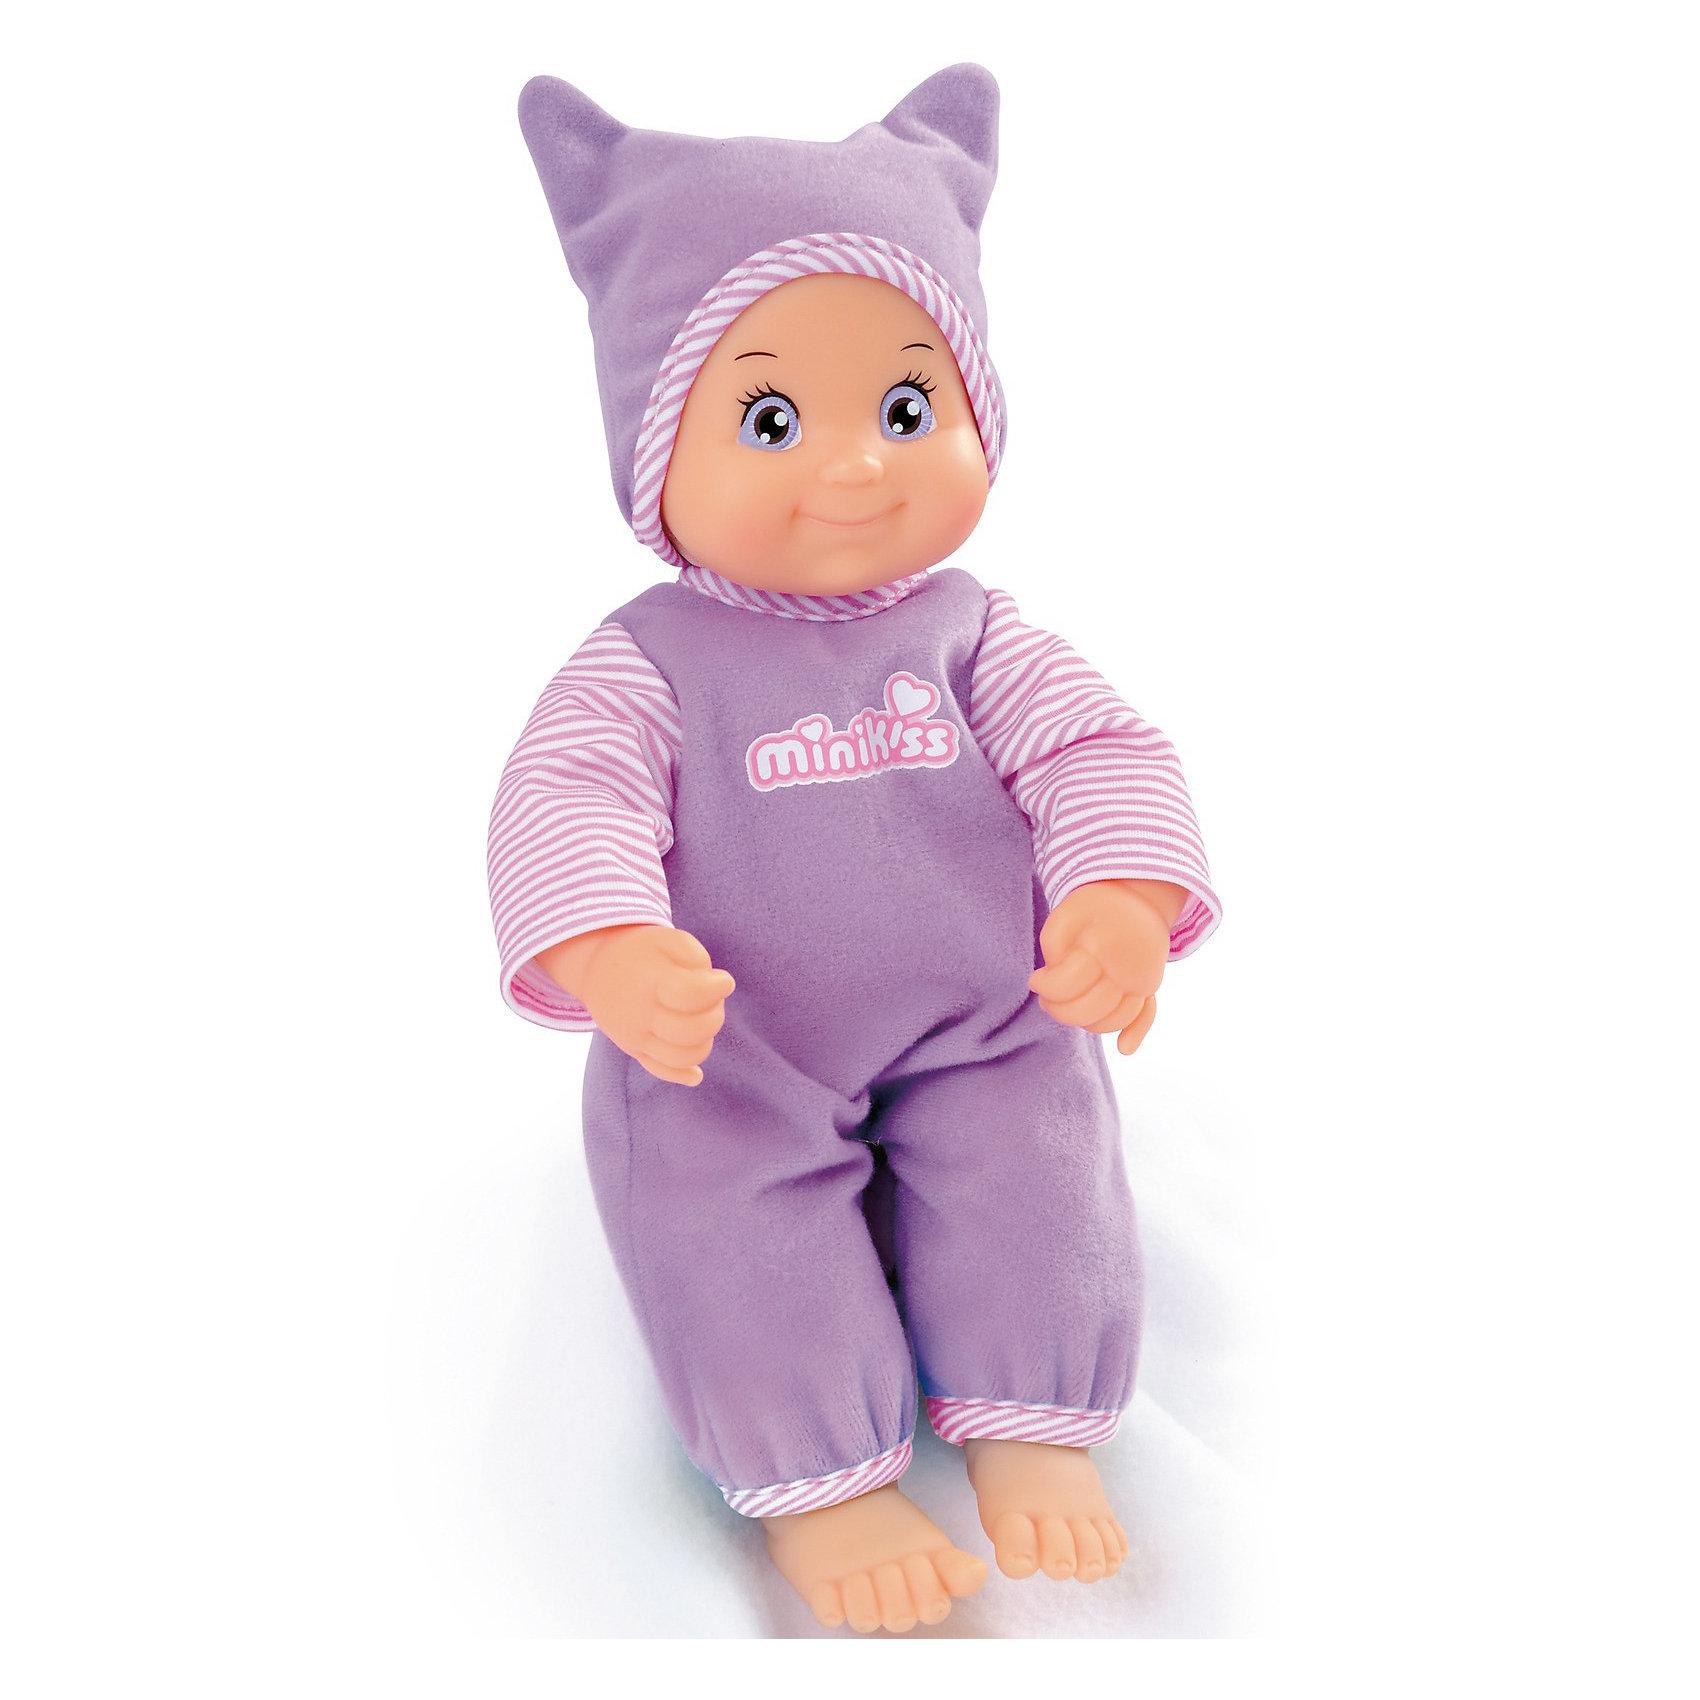 Smoby Интерактивная Кукла Minikiss, 27 см.